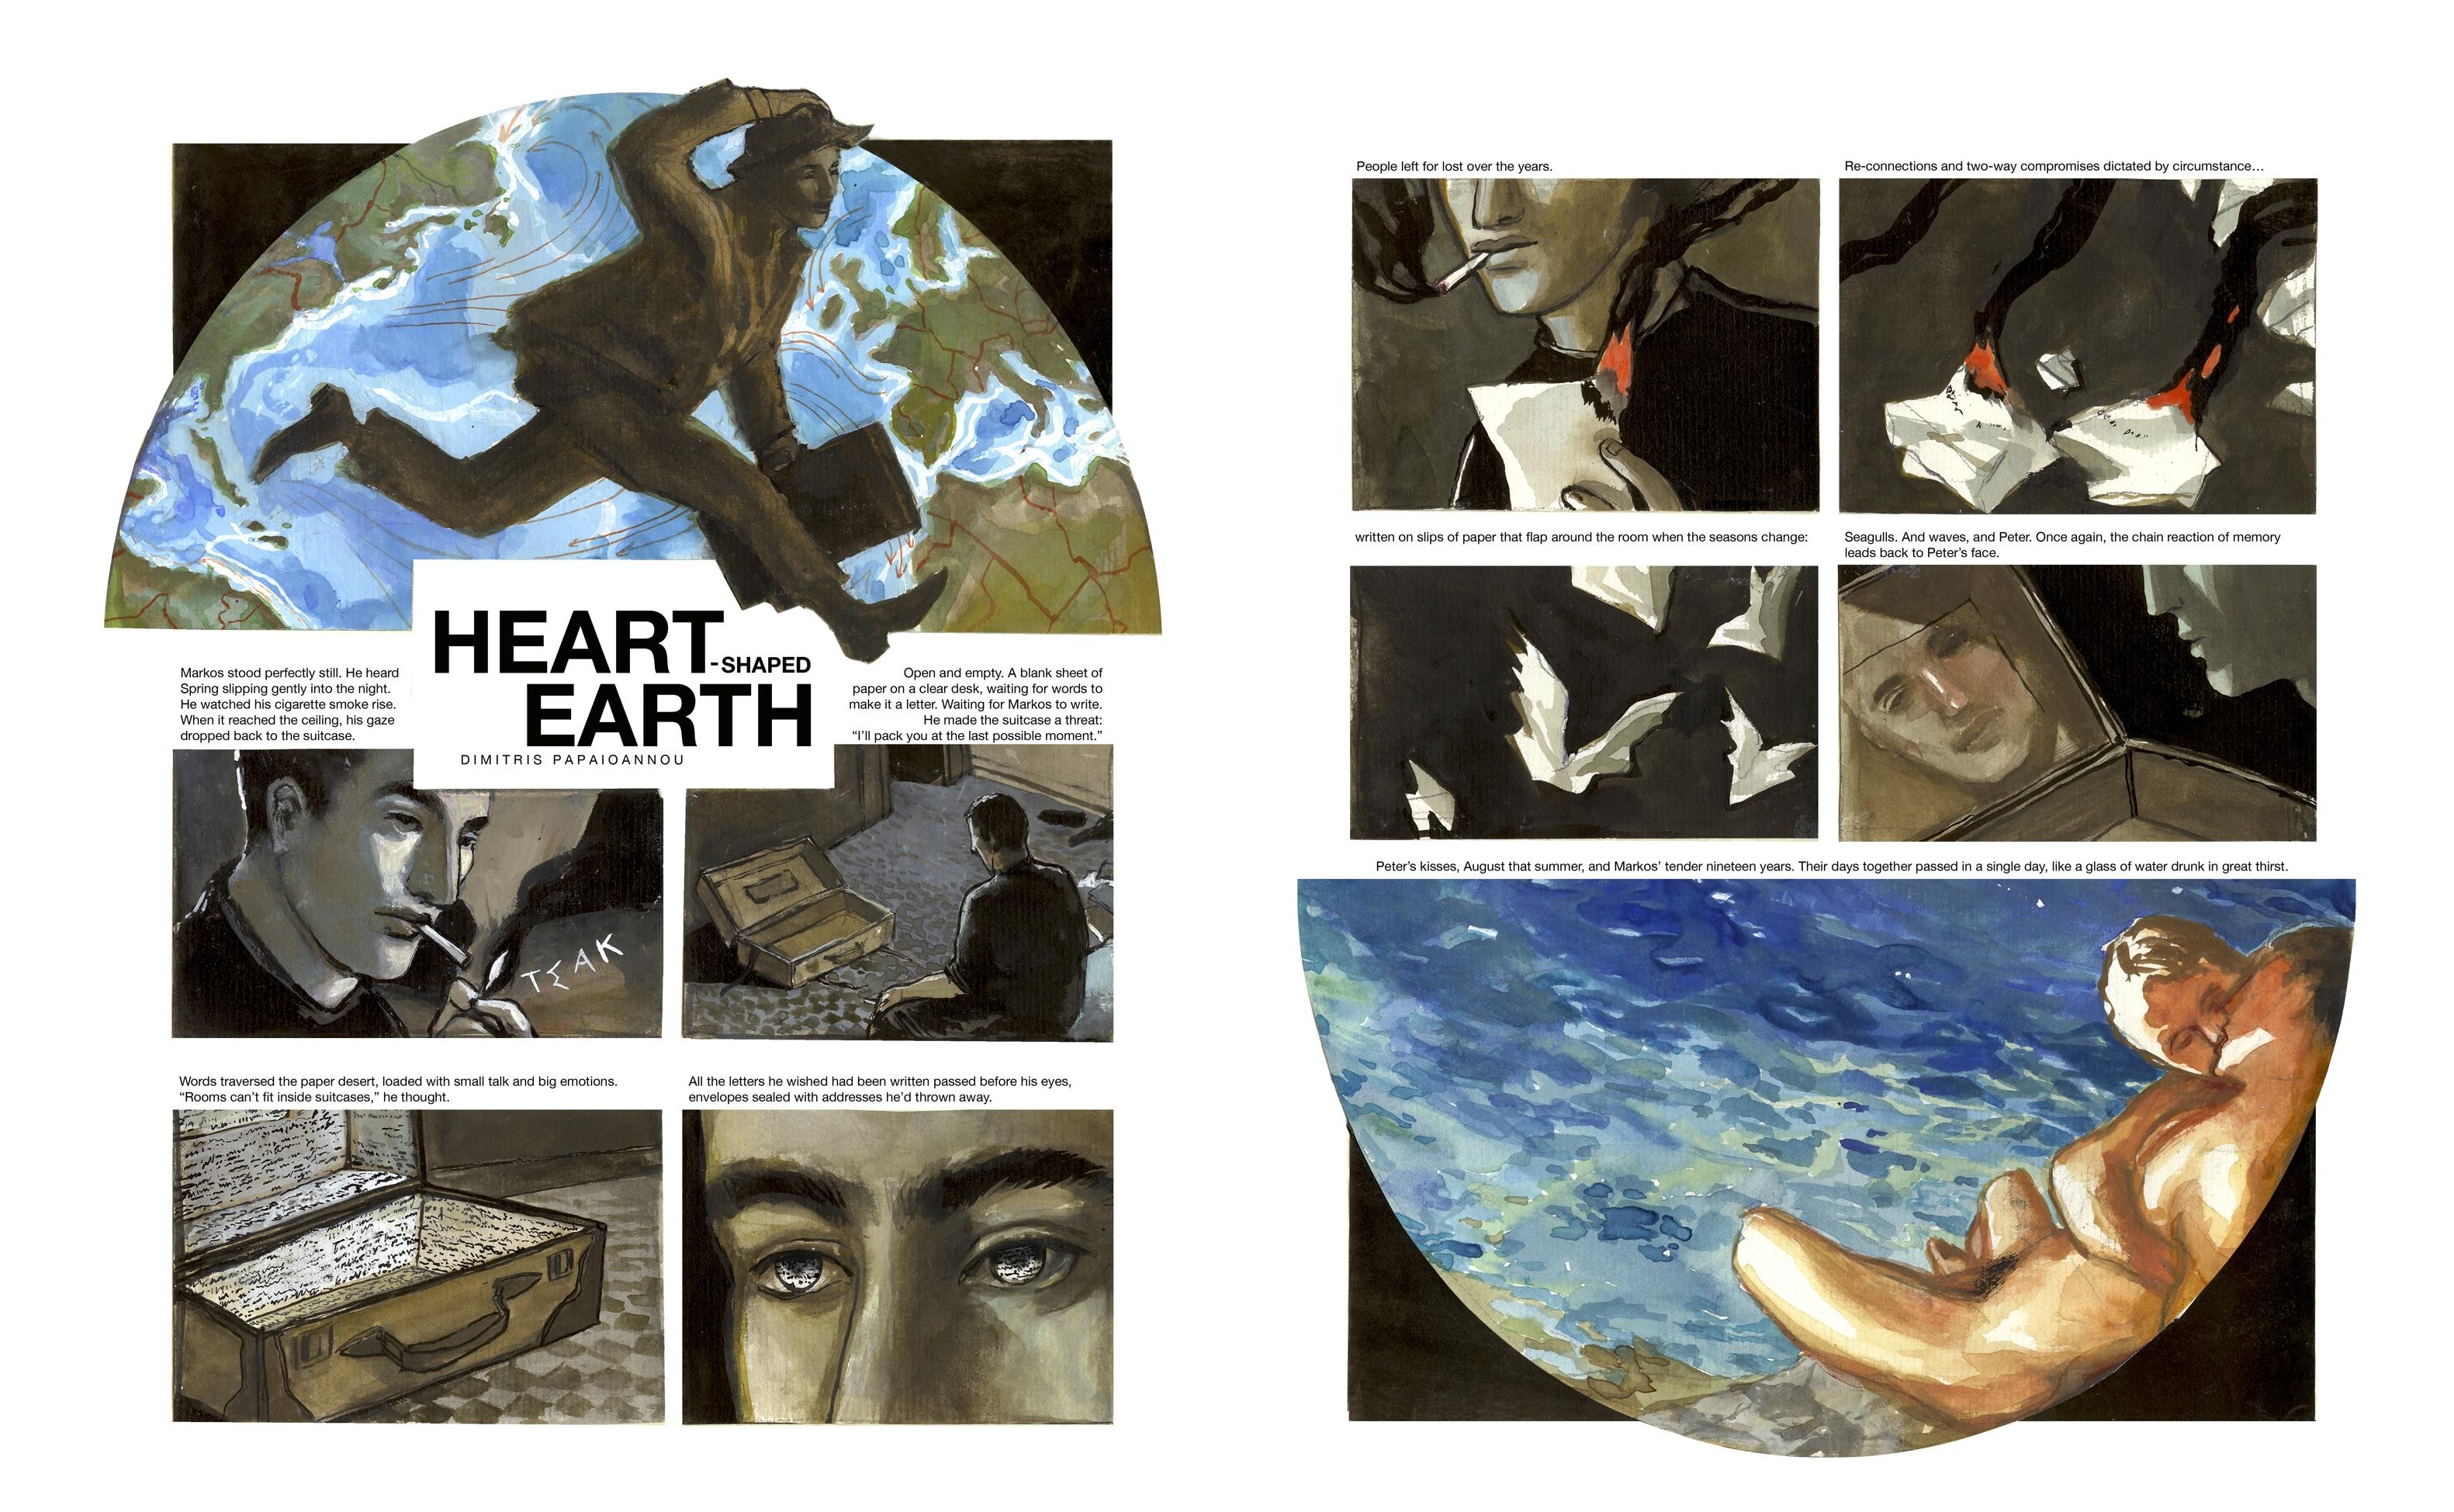 Dimitris Papaioannou, Heart-shaped Earth, Gay Comics, Queer Comics, Greece